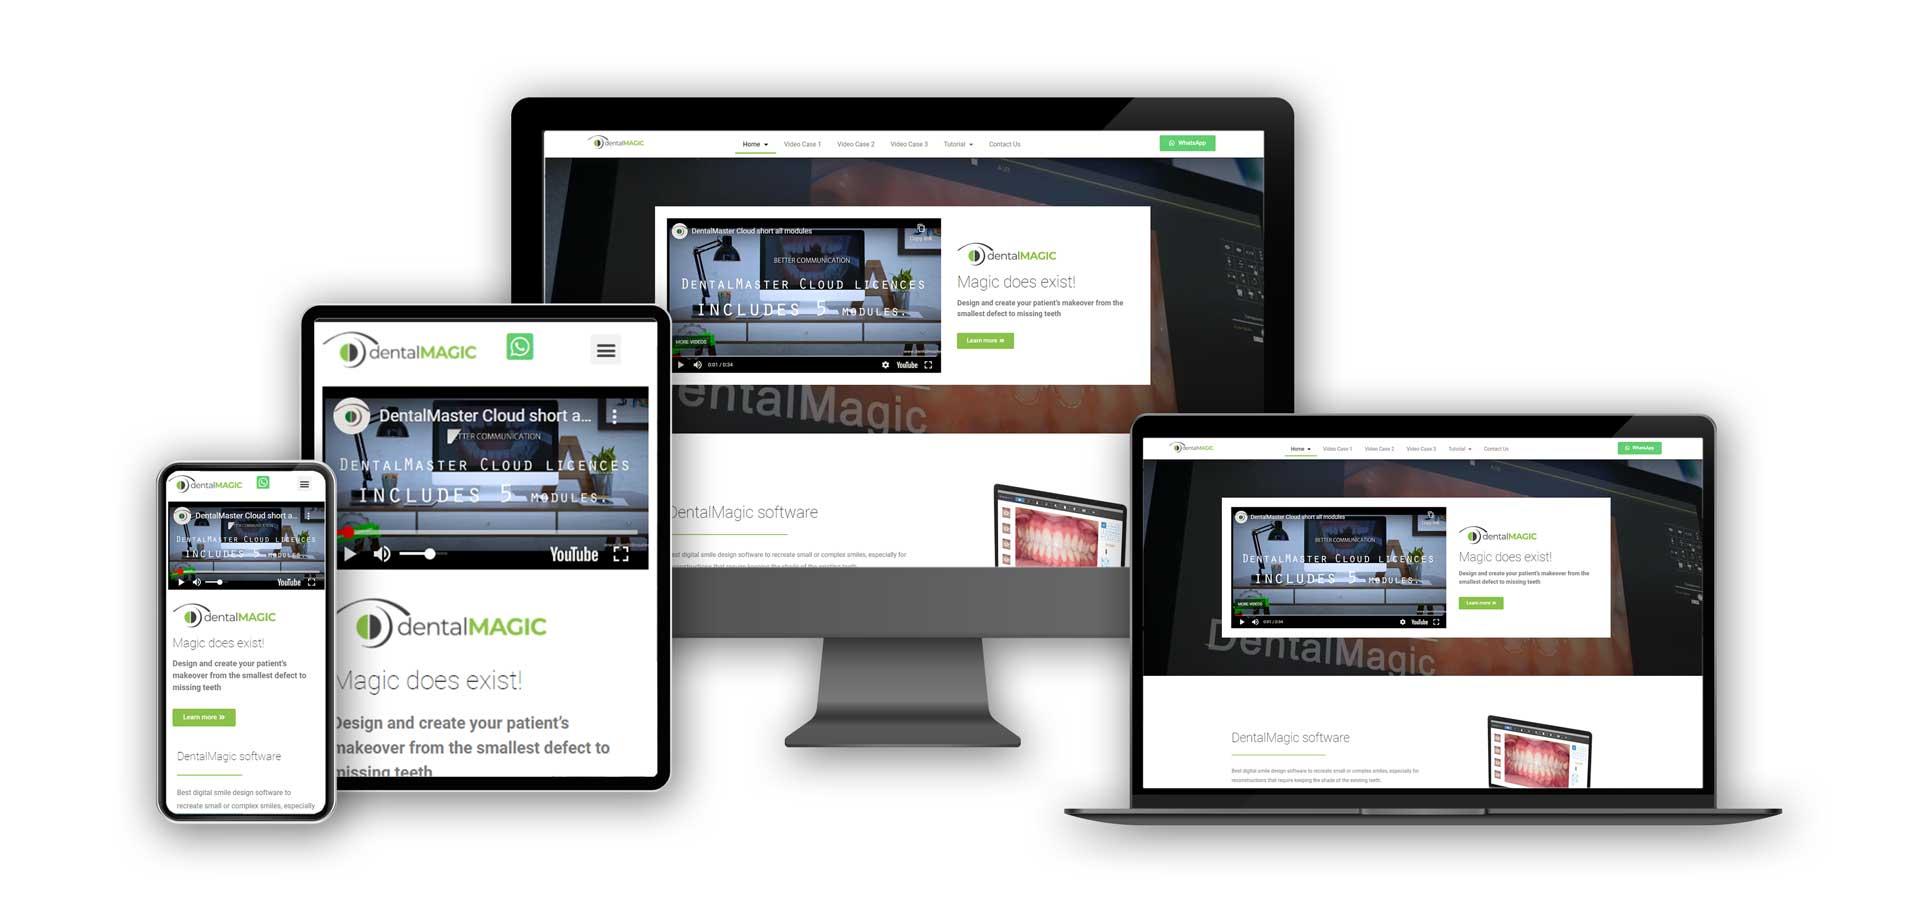 IDentalMagic-website on various screens